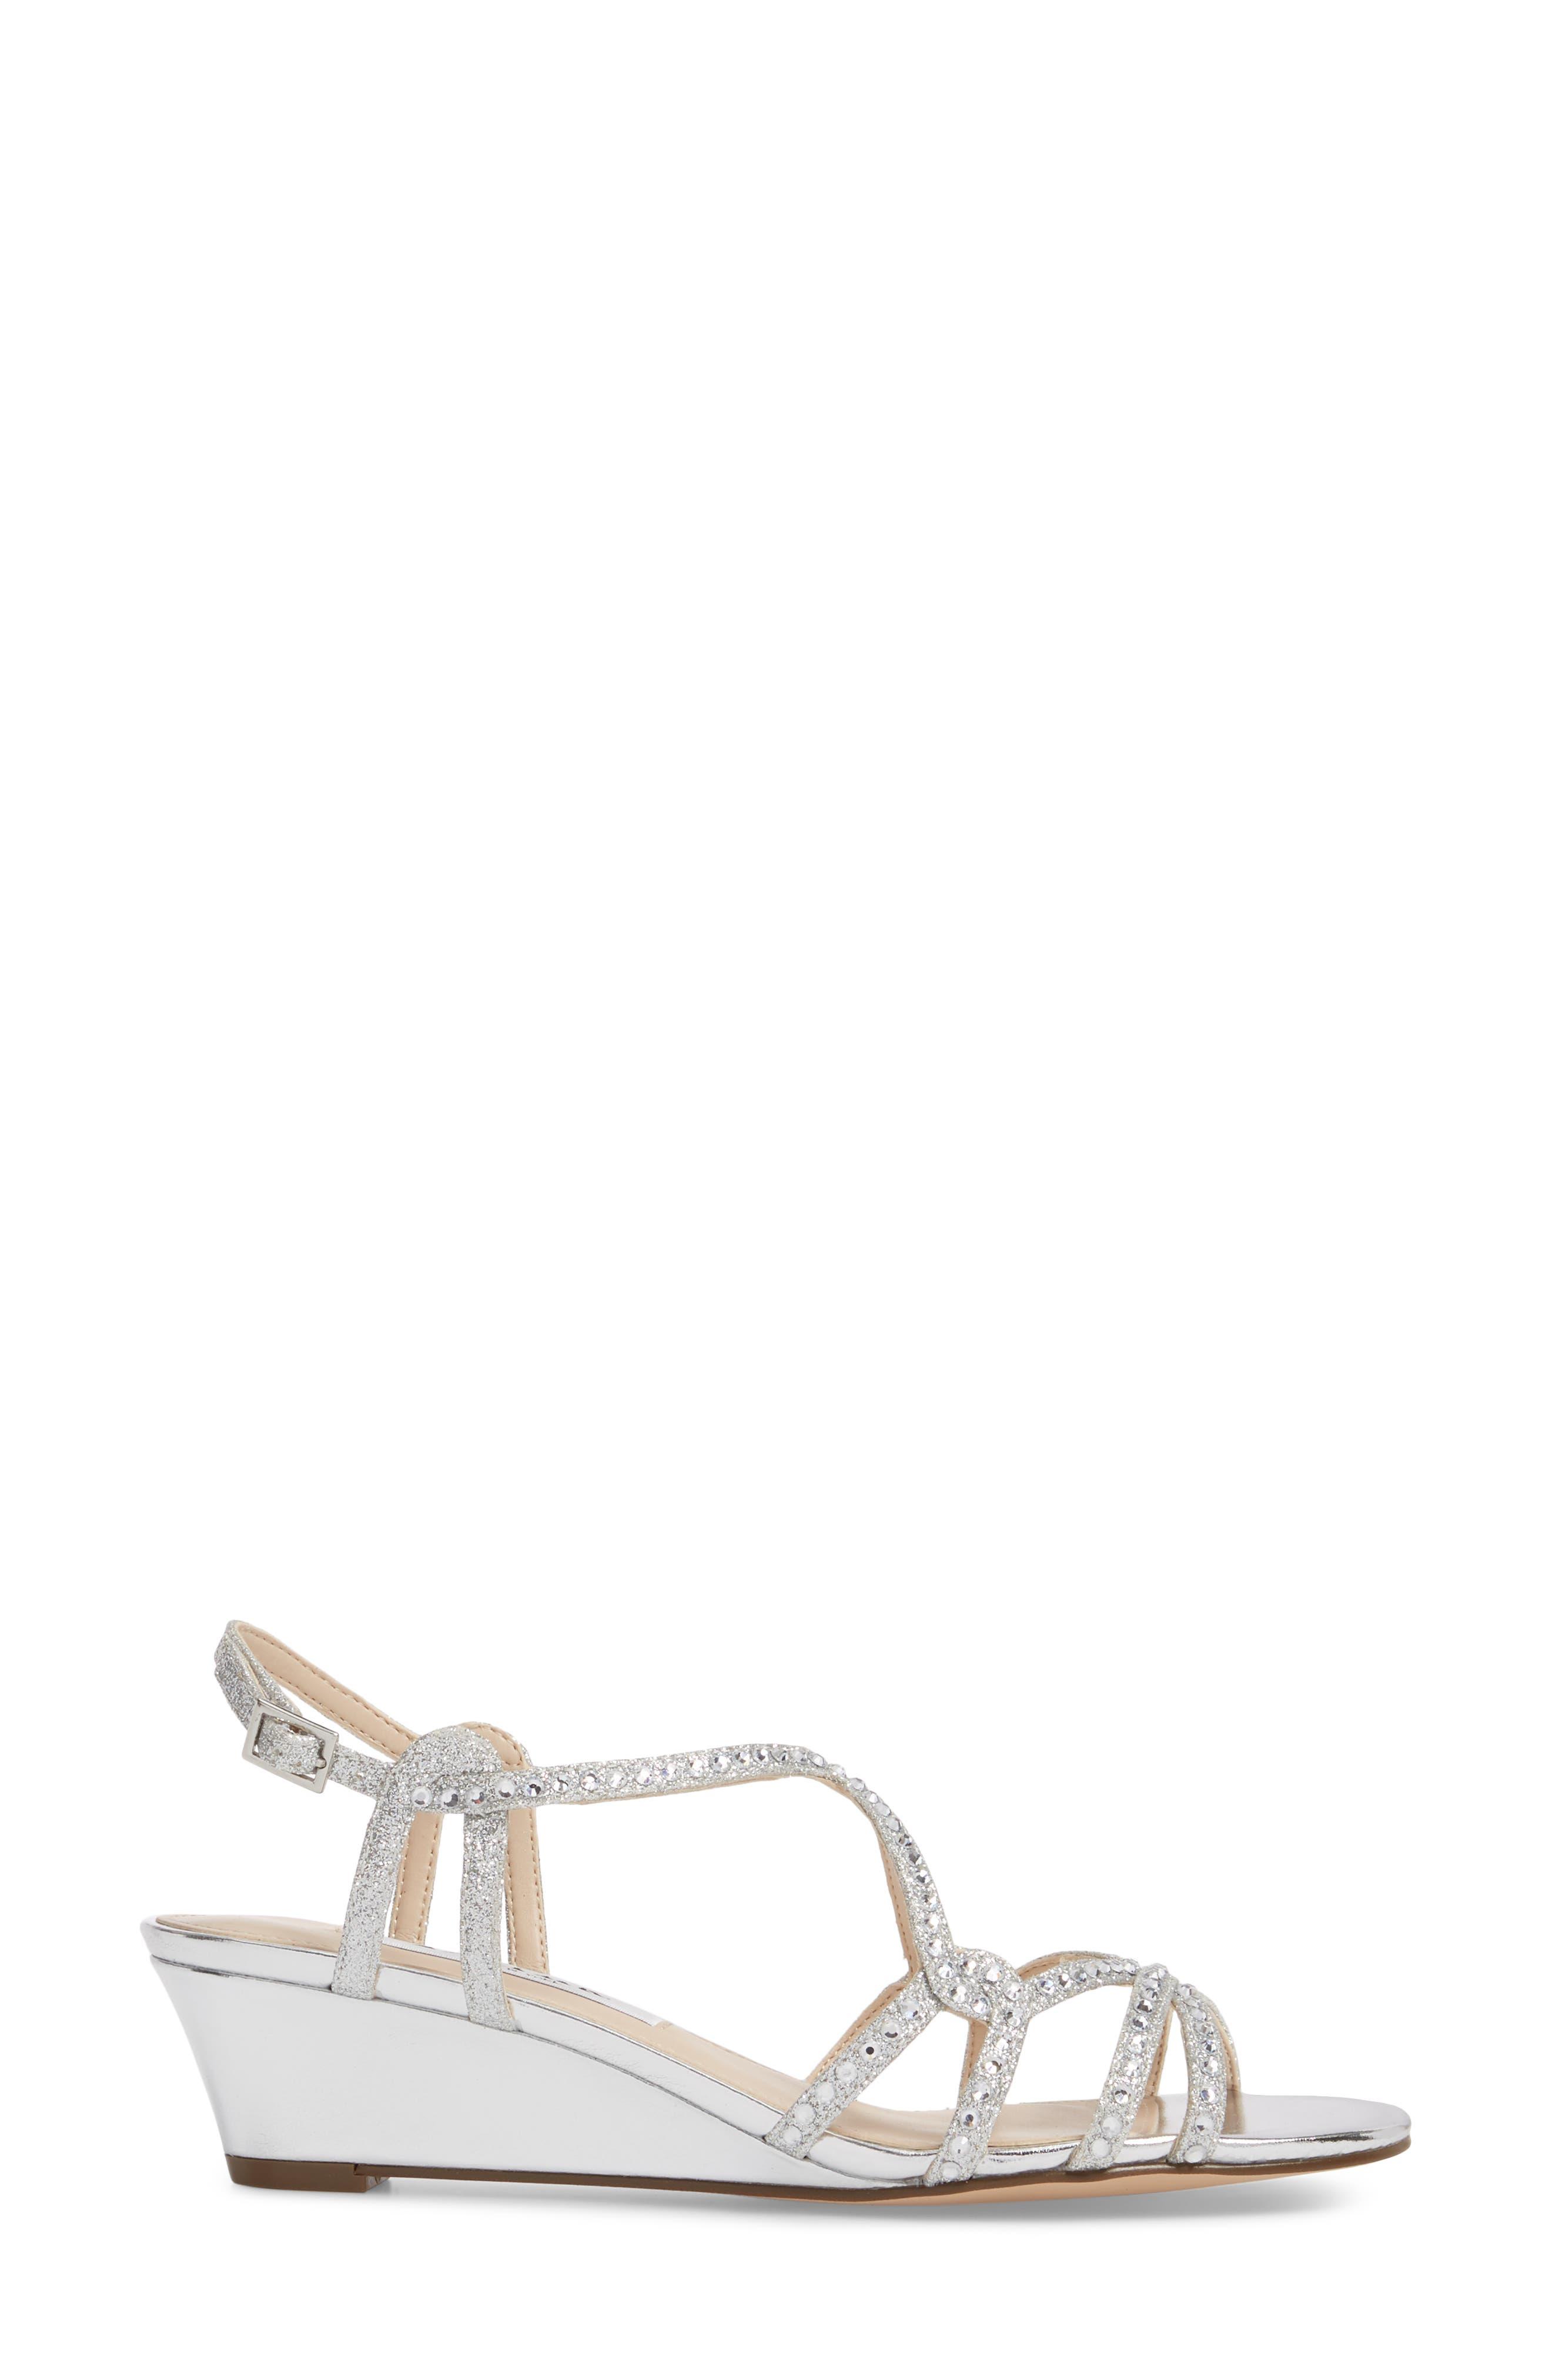 Finola Sandal,                             Alternate thumbnail 3, color,                             Silver Glitter Fabric